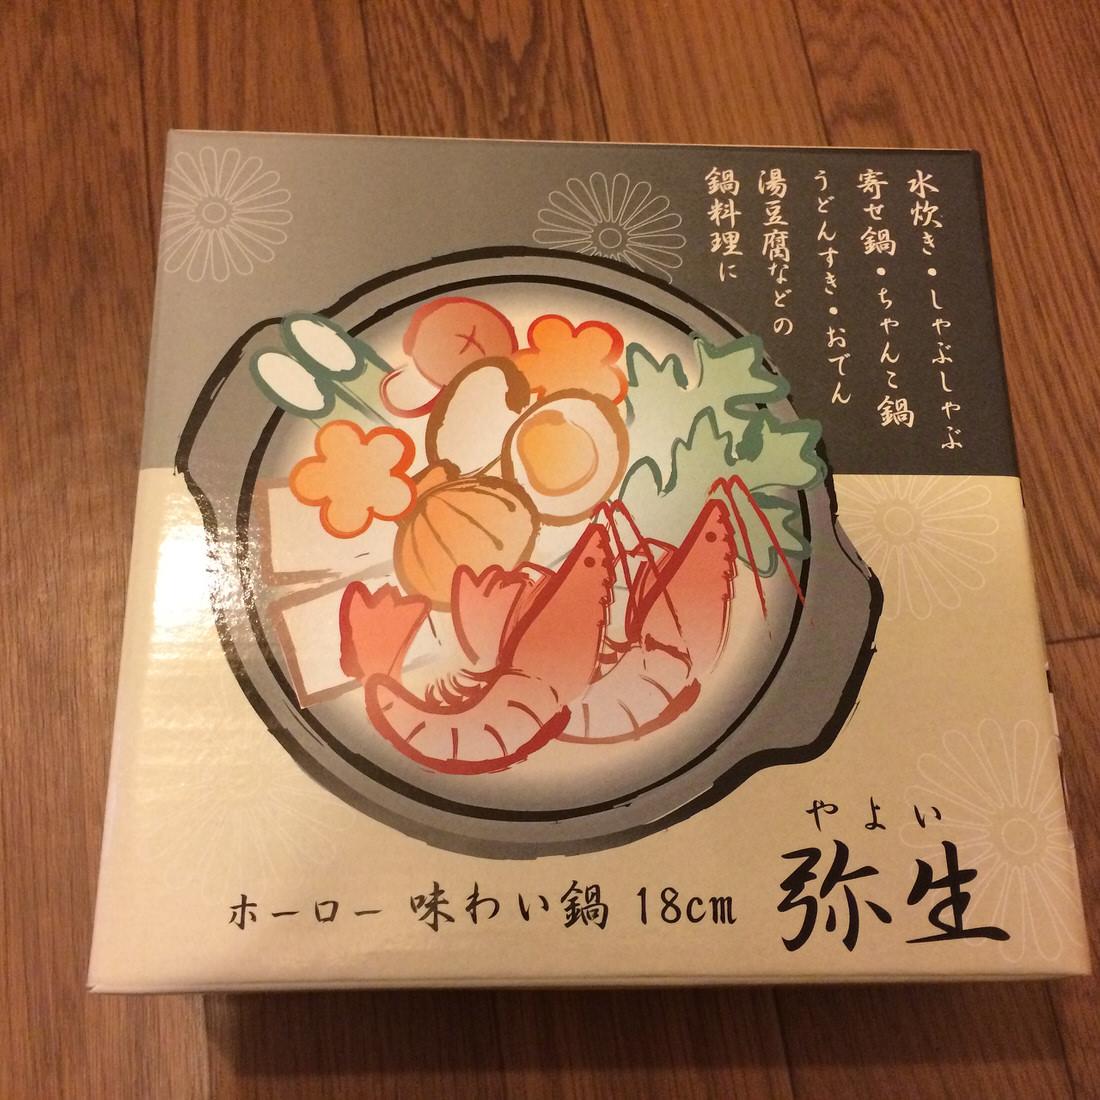 IH対応!一人鍋にピッタリのホーロー鍋が作りと雰囲気もいい感じ!